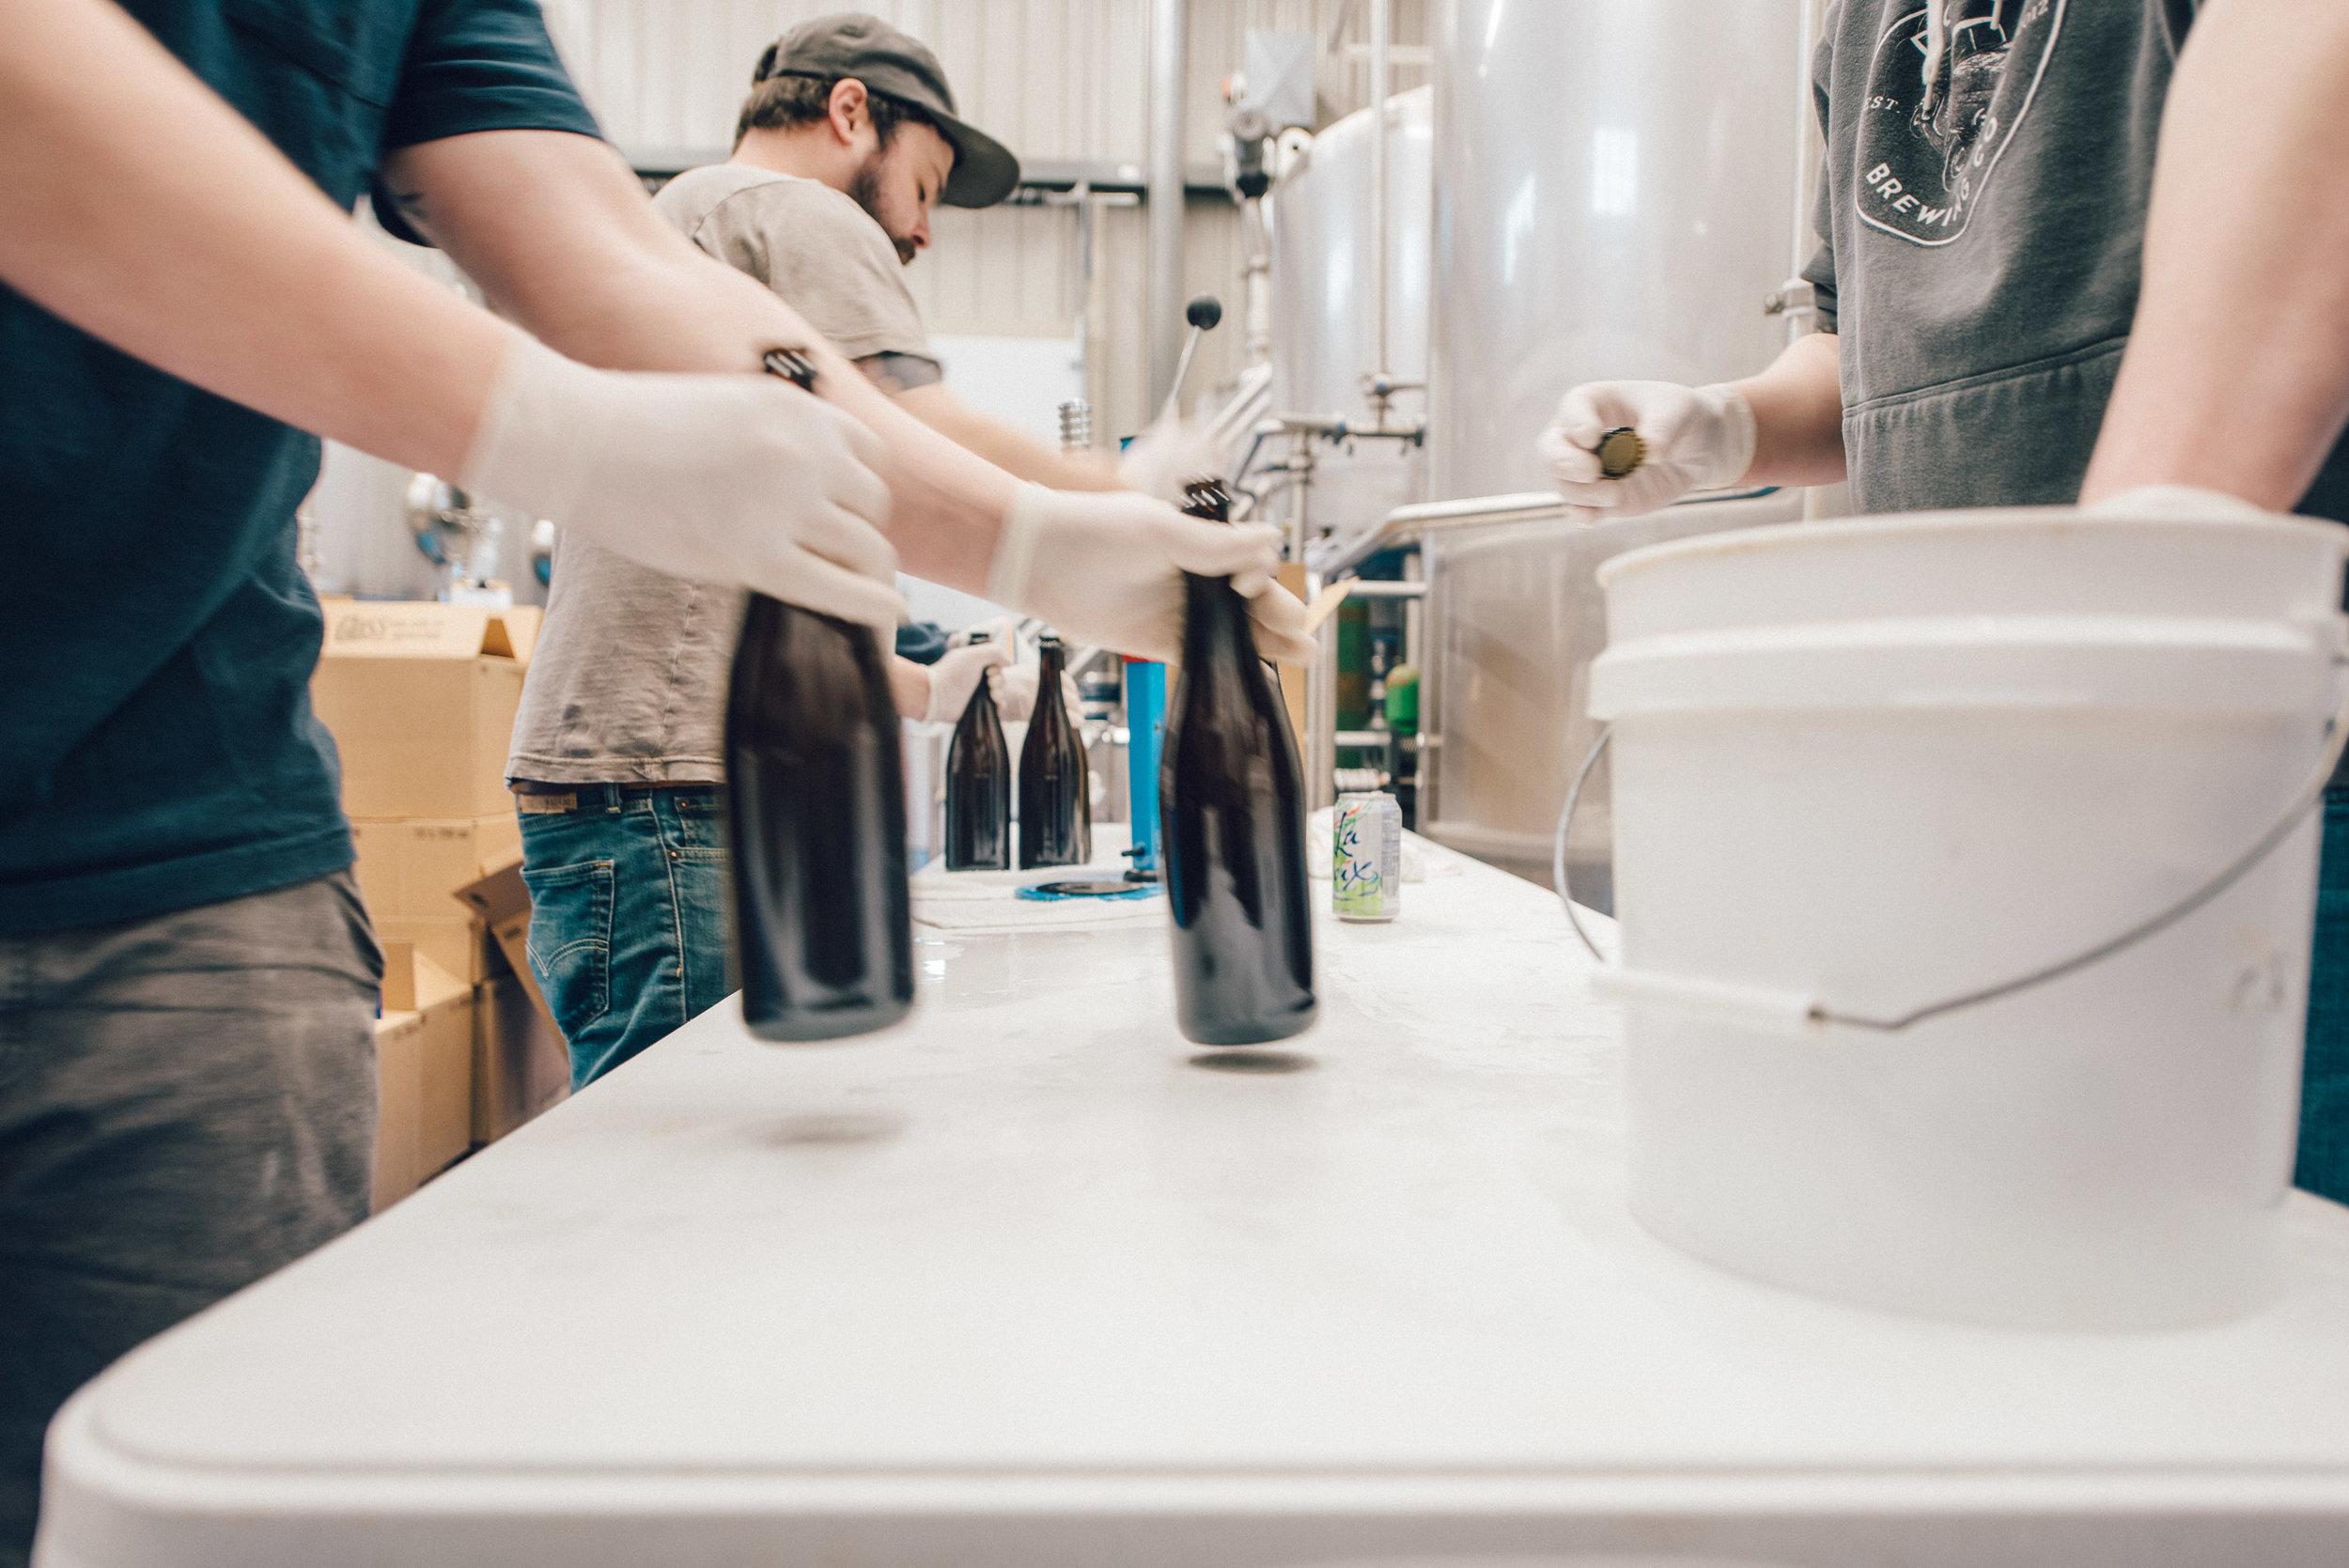 Hacienda-Beer-Co-Bottling-Le-Printemps-6.jpg